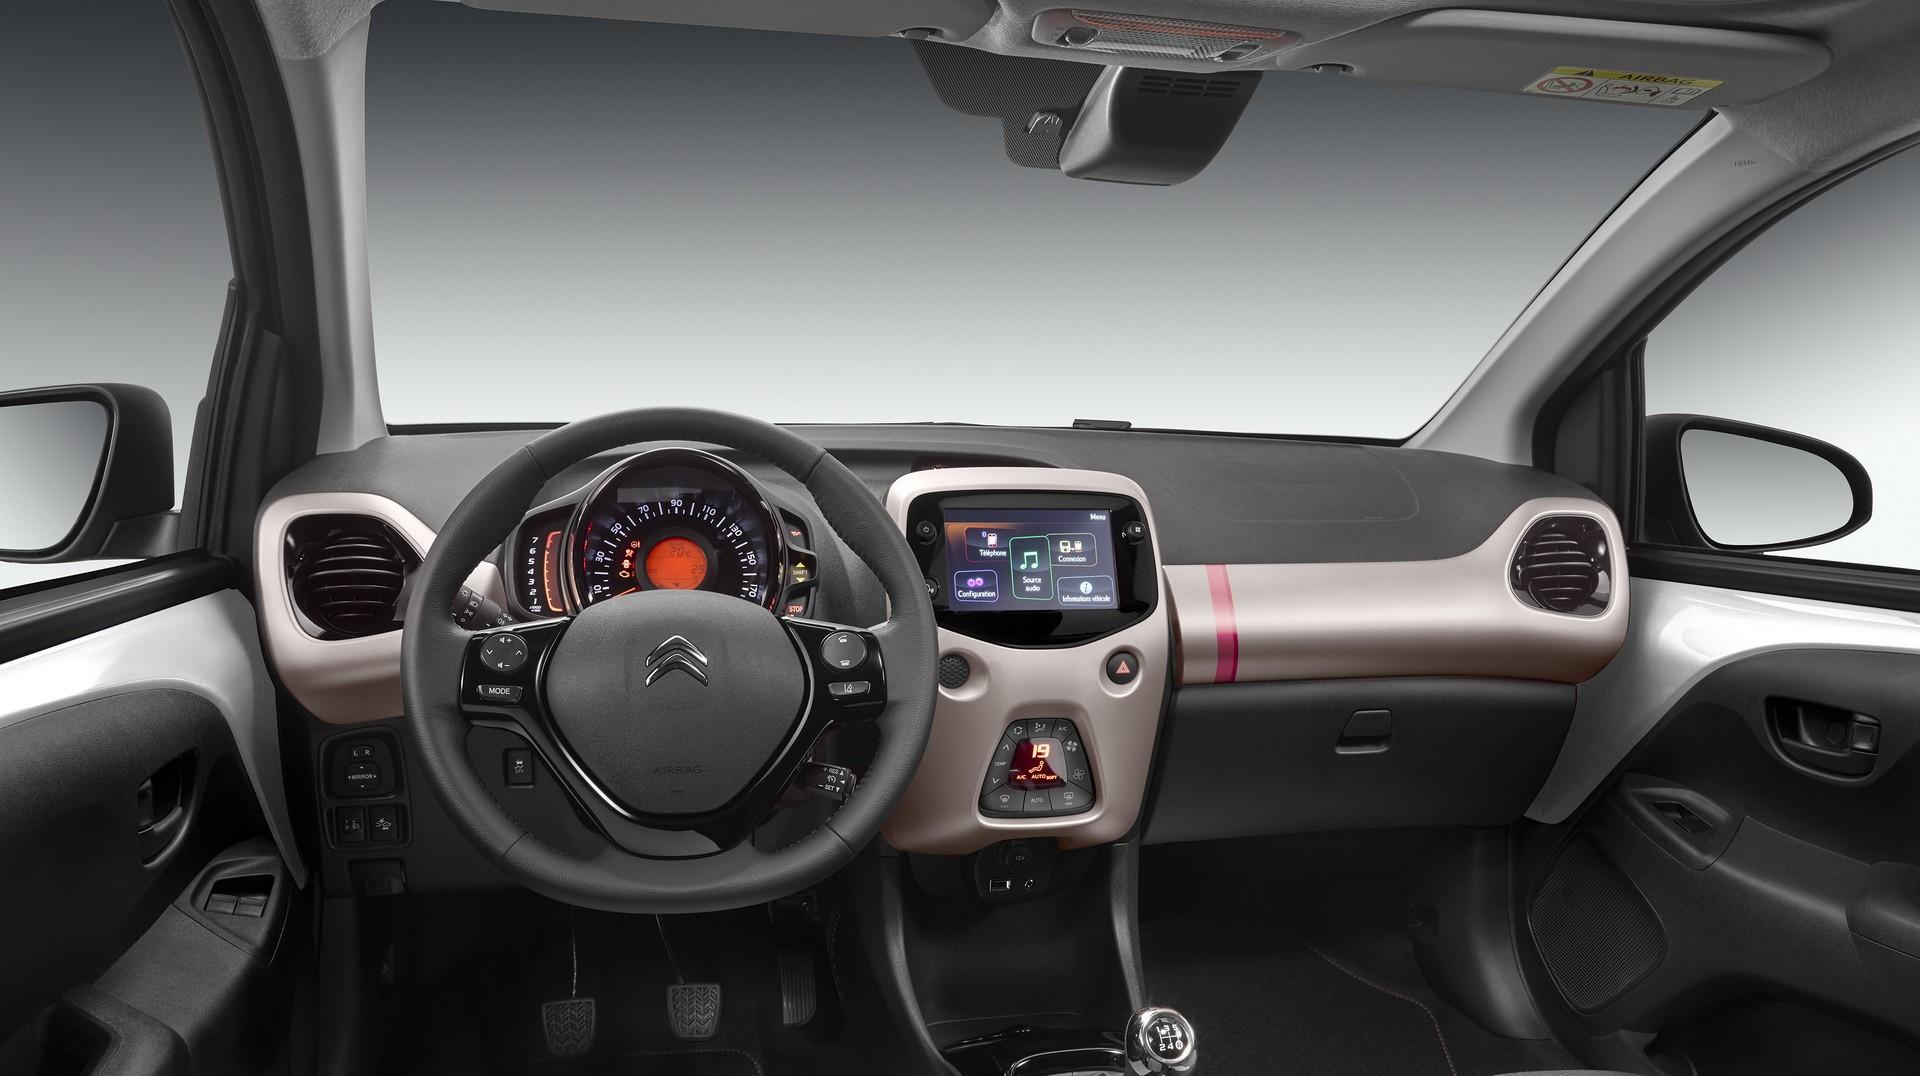 New Citroen Berlingo 2018 >> 2018 Citroen C1 Benefits From More Power, Further Personalization Options - autoevolution